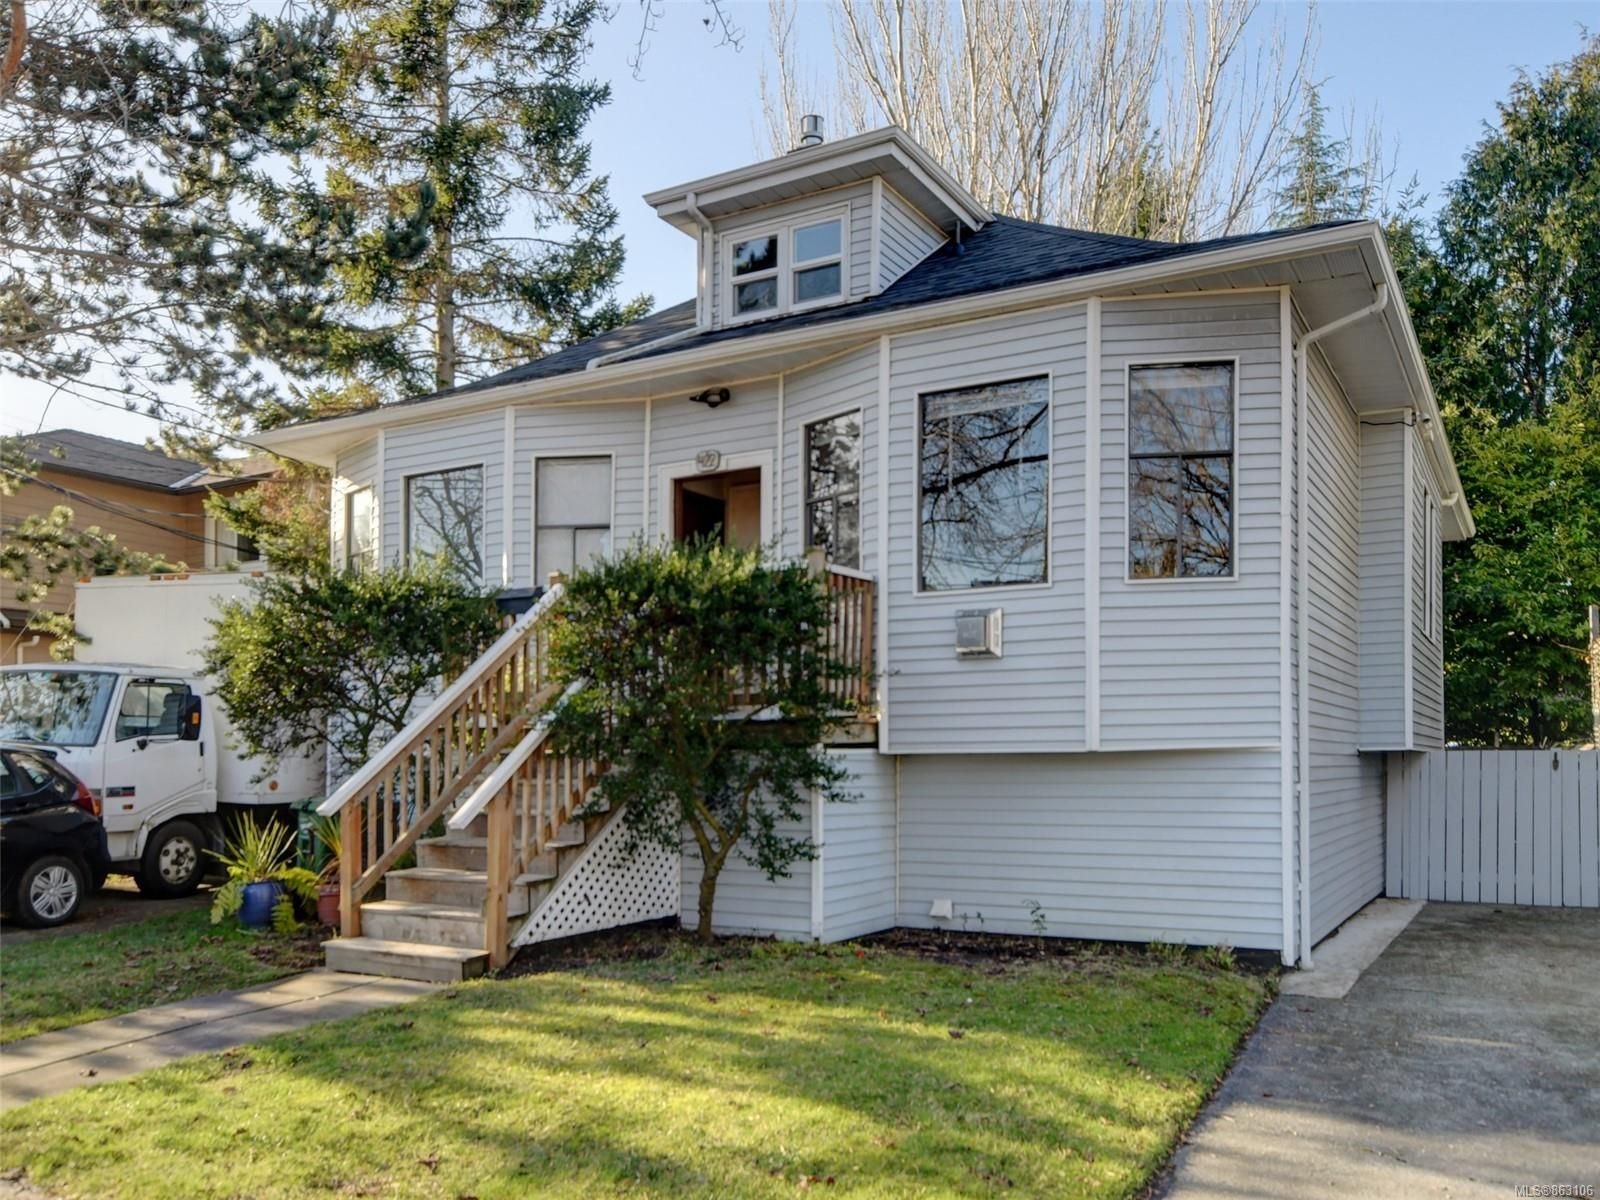 Main Photo: 422 Powell St in : Vi James Bay Full Duplex for sale (Victoria)  : MLS®# 863106